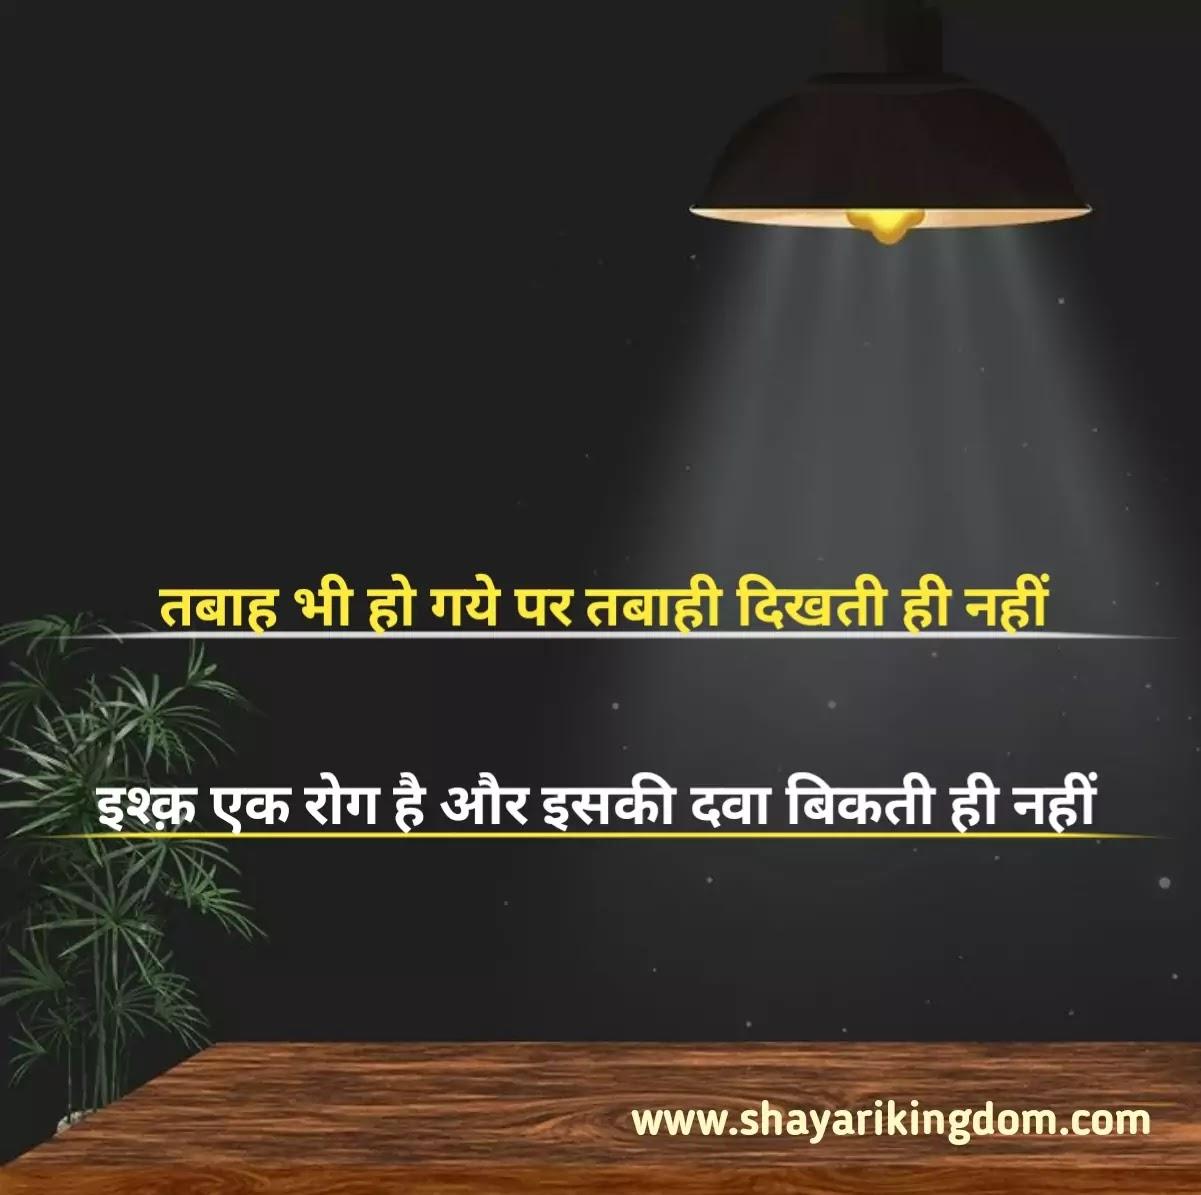 Best hindi shayari collection 2020 | shayarikingdom.com